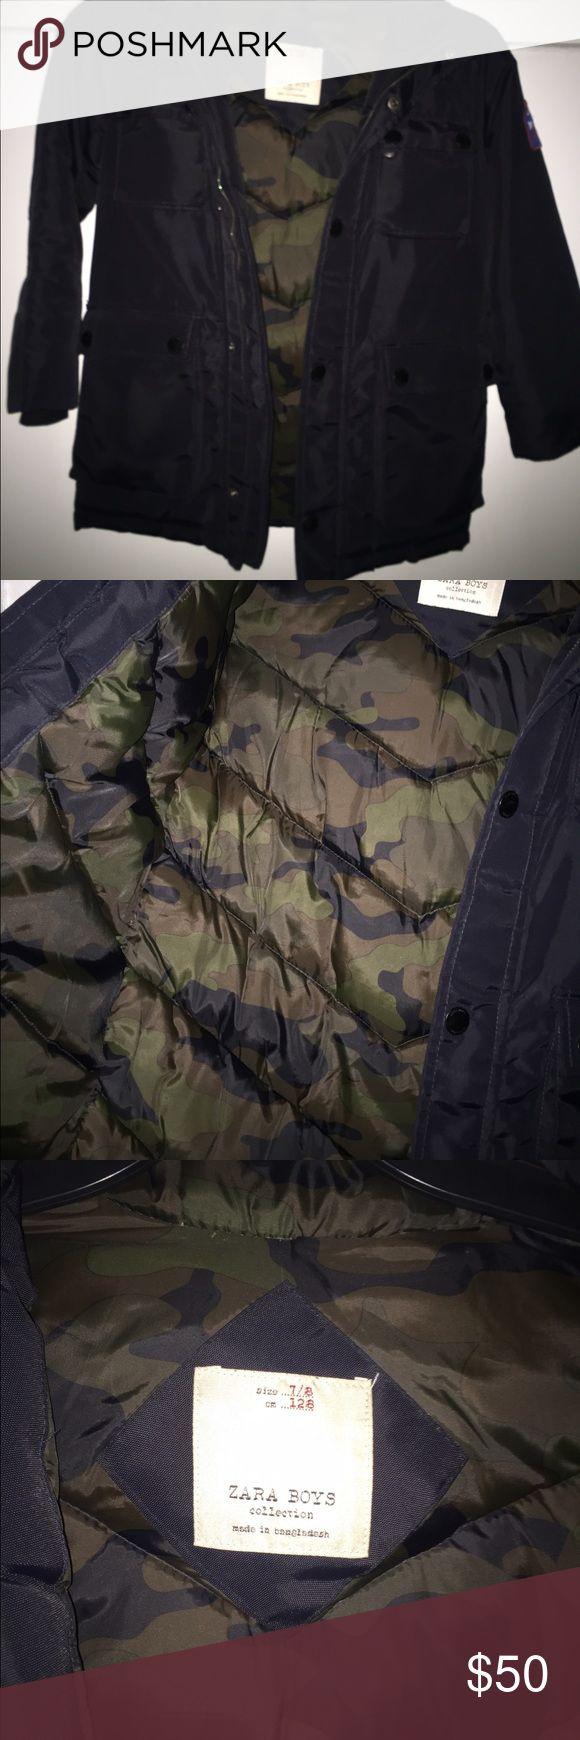 Zara winter jacket Great used condition Zara Jackets & Coats Puffers